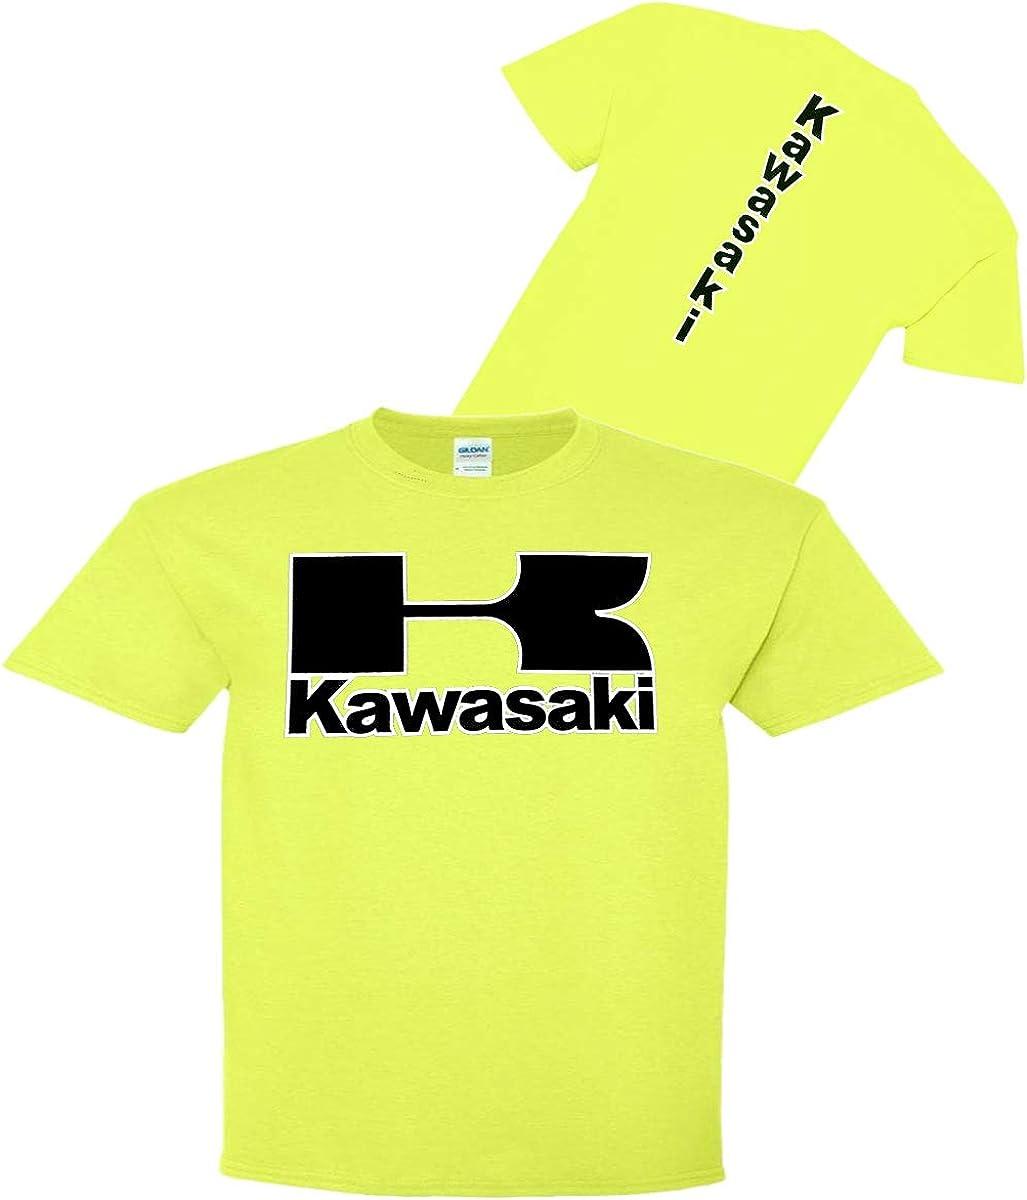 Galiti Kawasaki - Camiseta de Seguridad para Motocicleta, Color ...